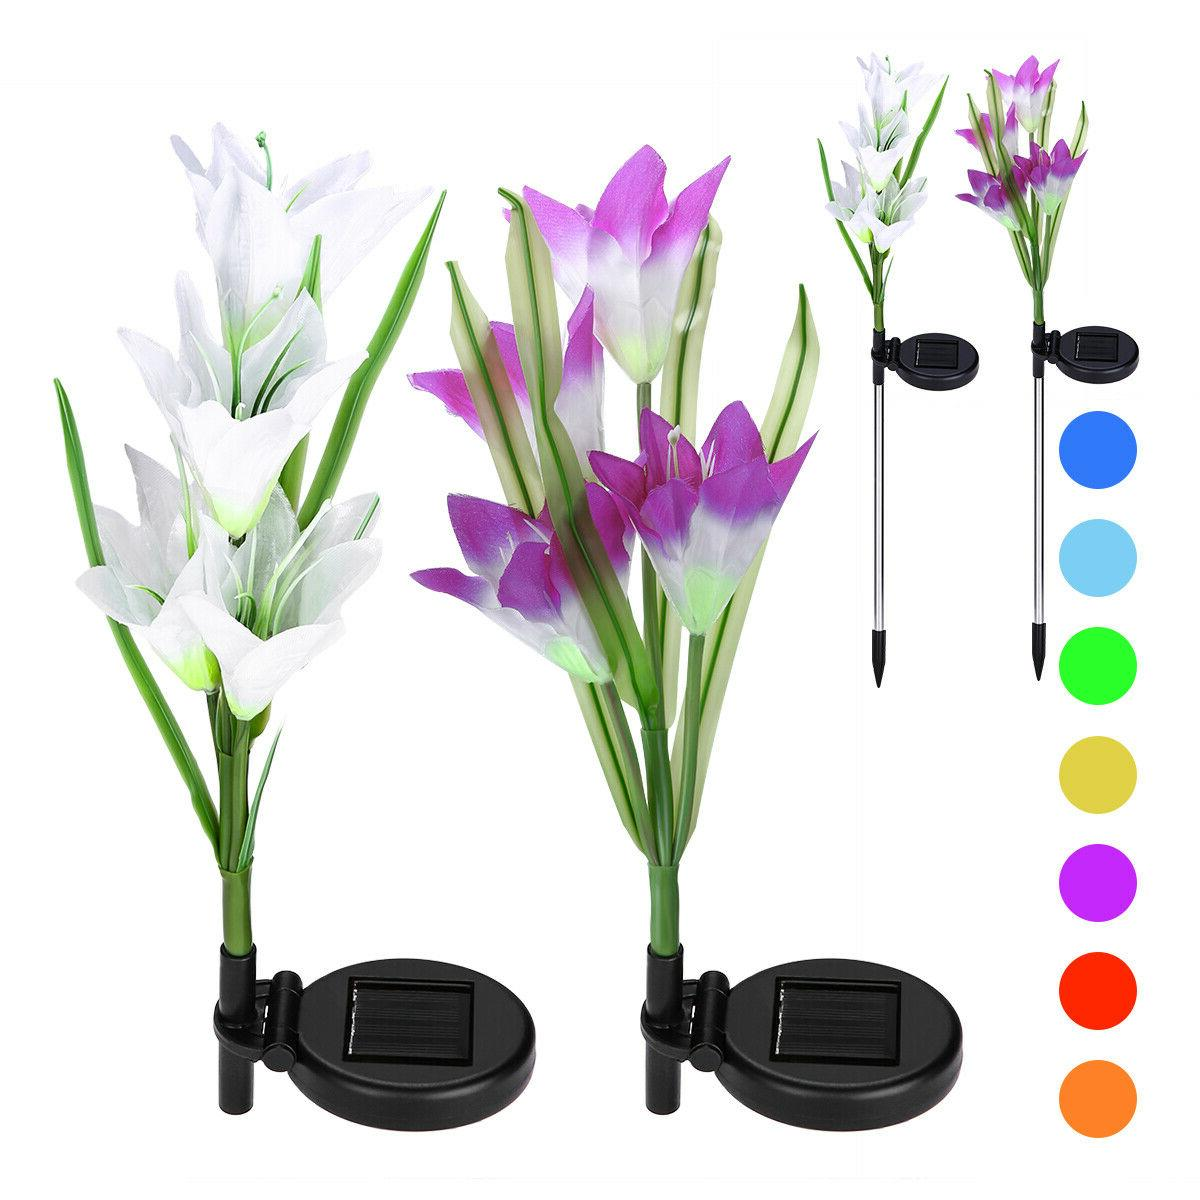 2 Pack Flowers Garden Multi-Color Outdoor Lamp